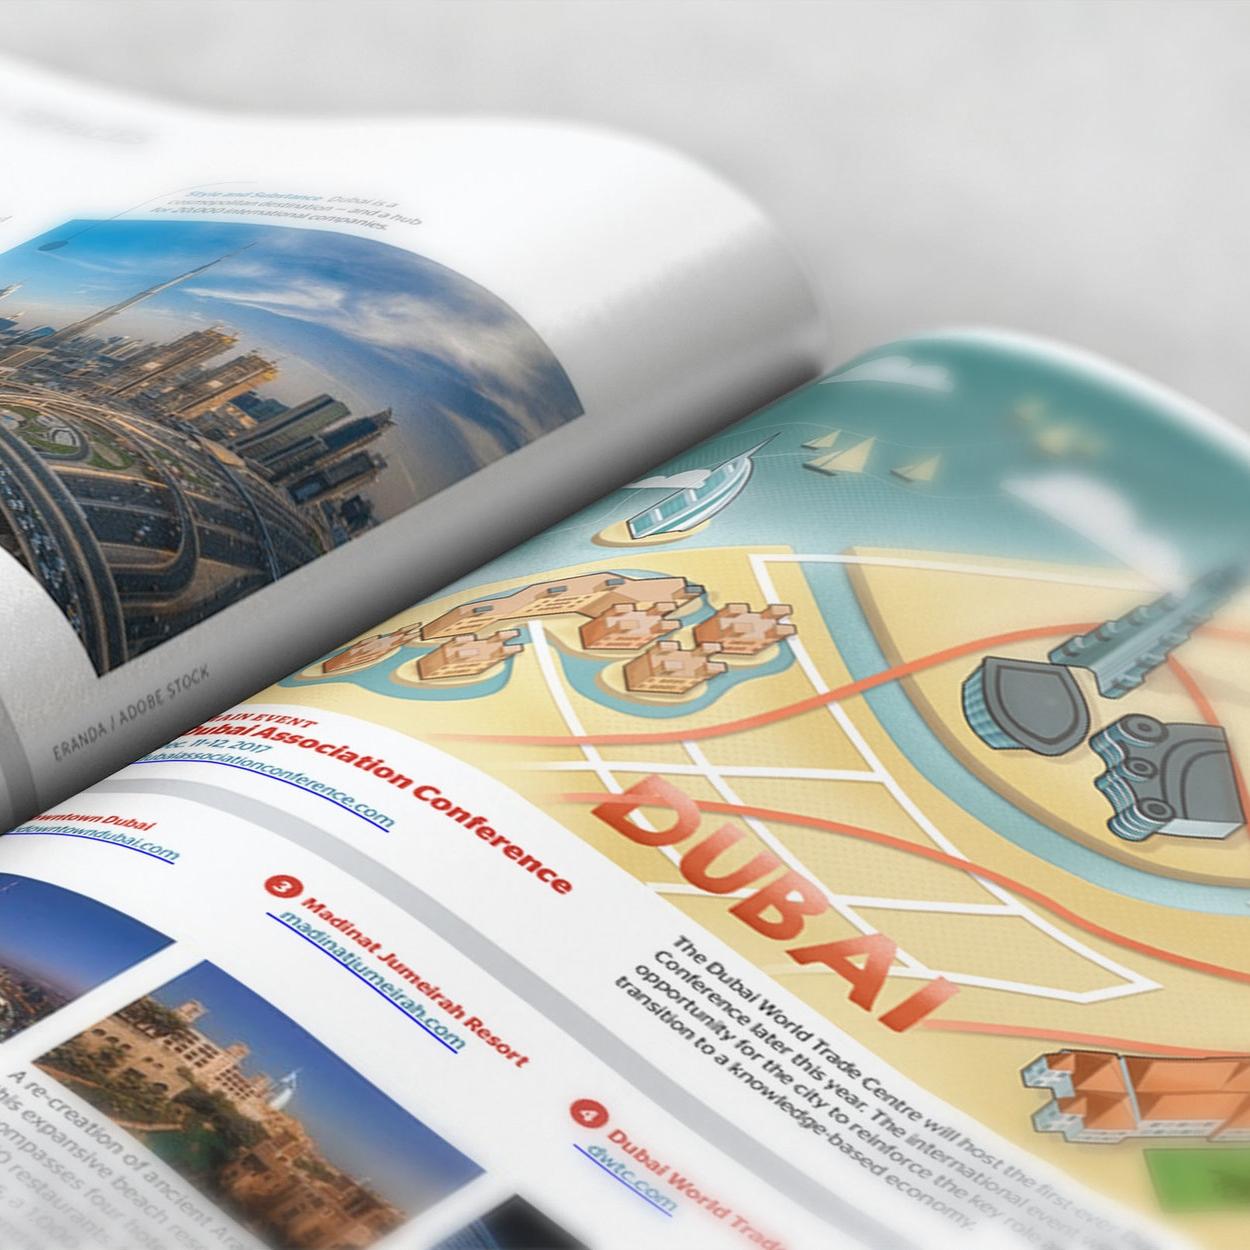 Reddin-Designs-Dubai-Map-Convene-Magazine-1.jpg